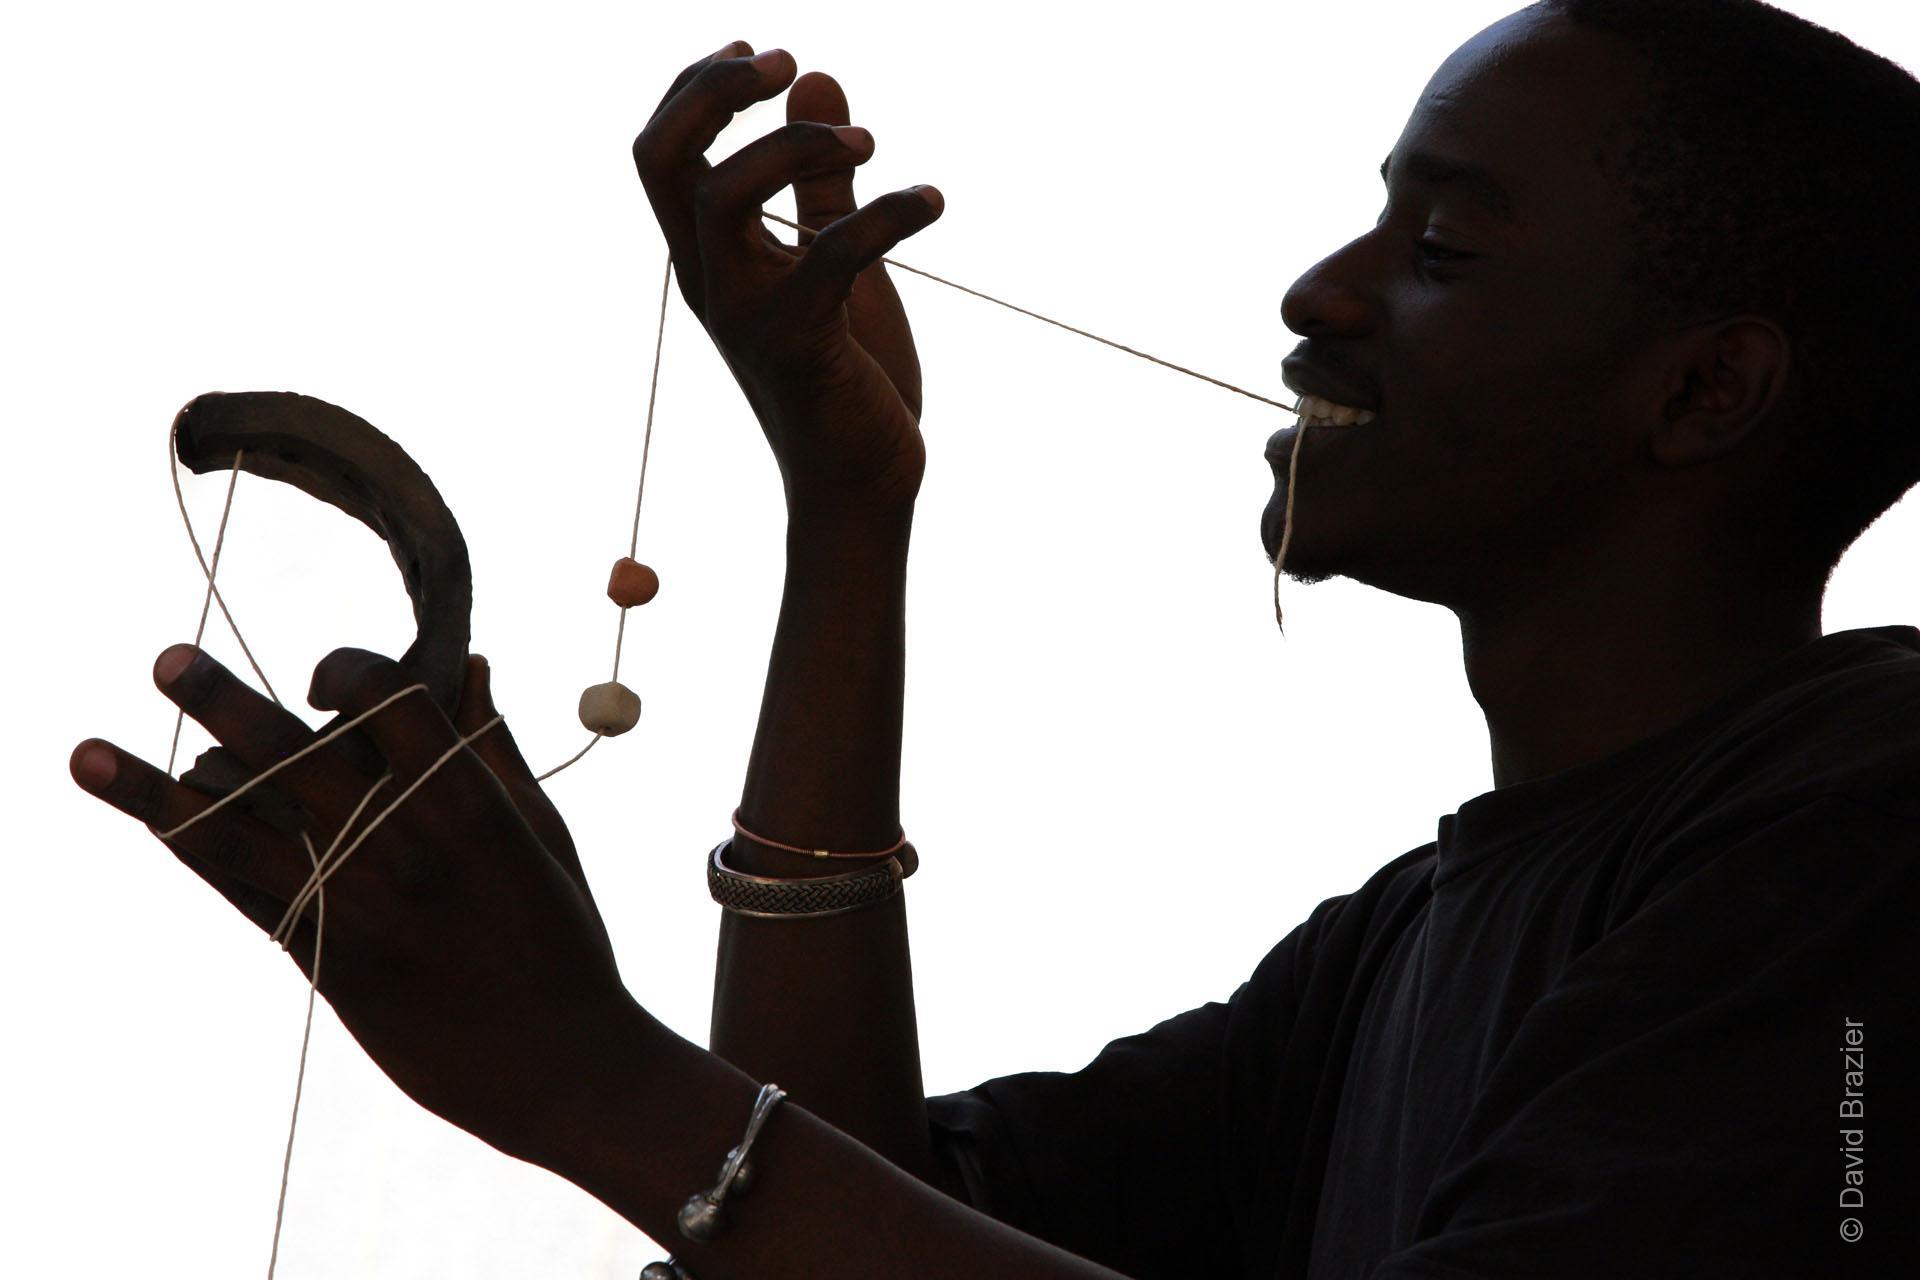 Portrait of Zimbabwean artist, Masimba Hwati, making a sculpture